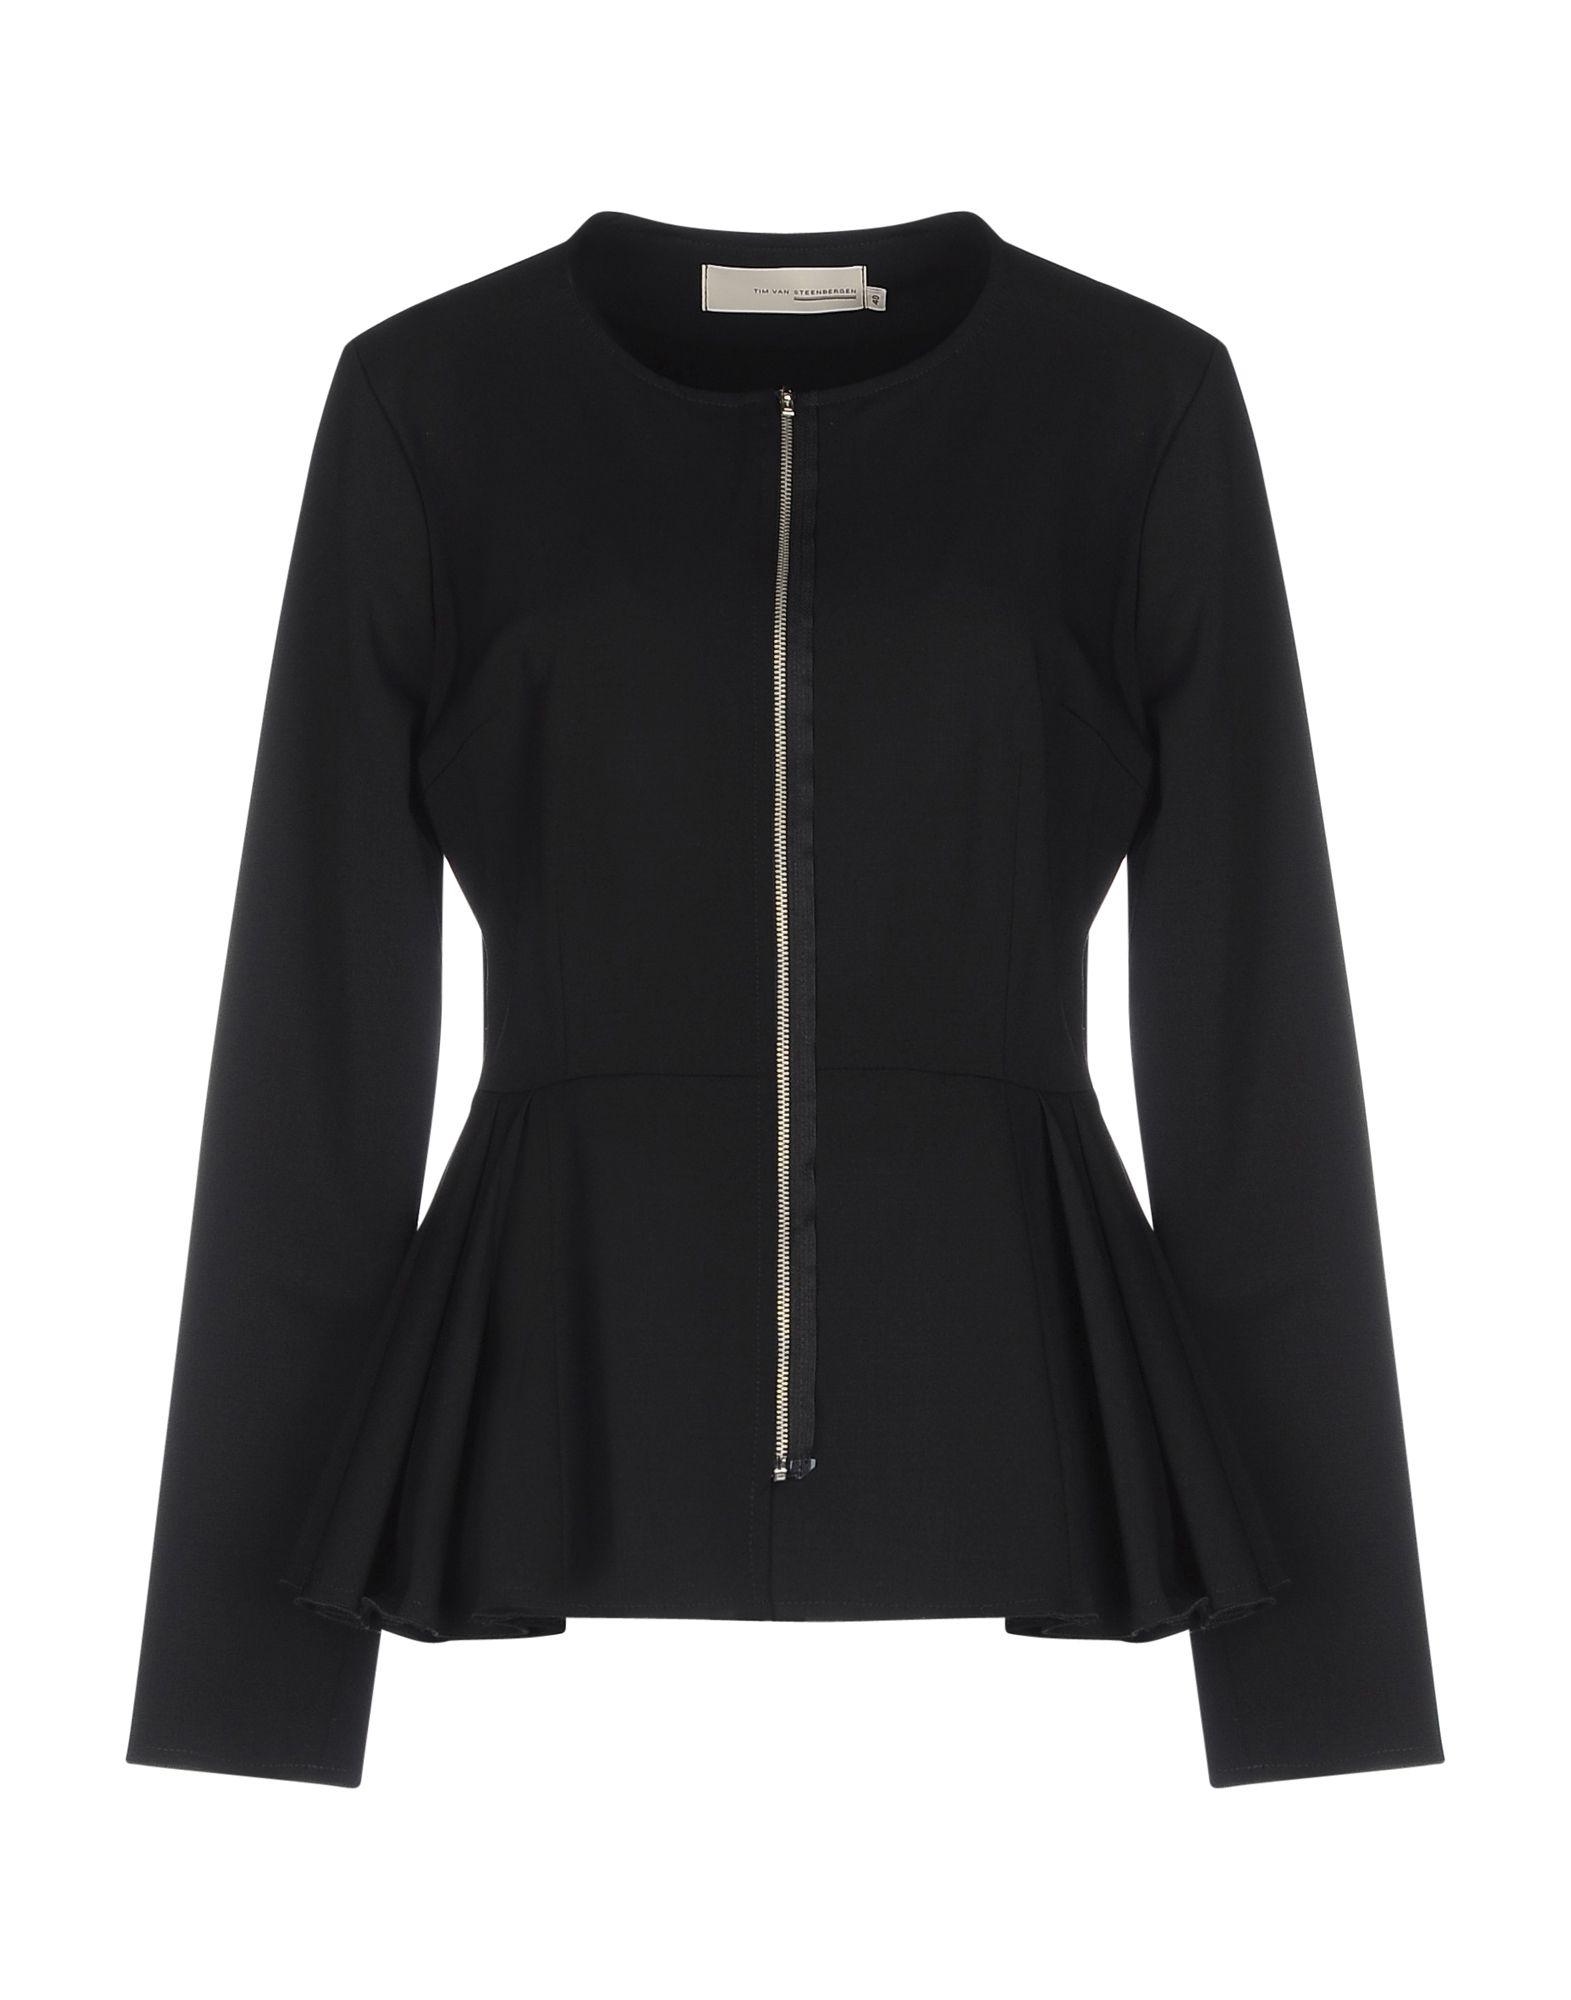 TIM VAN STEENBERGEN Пиджак цены онлайн